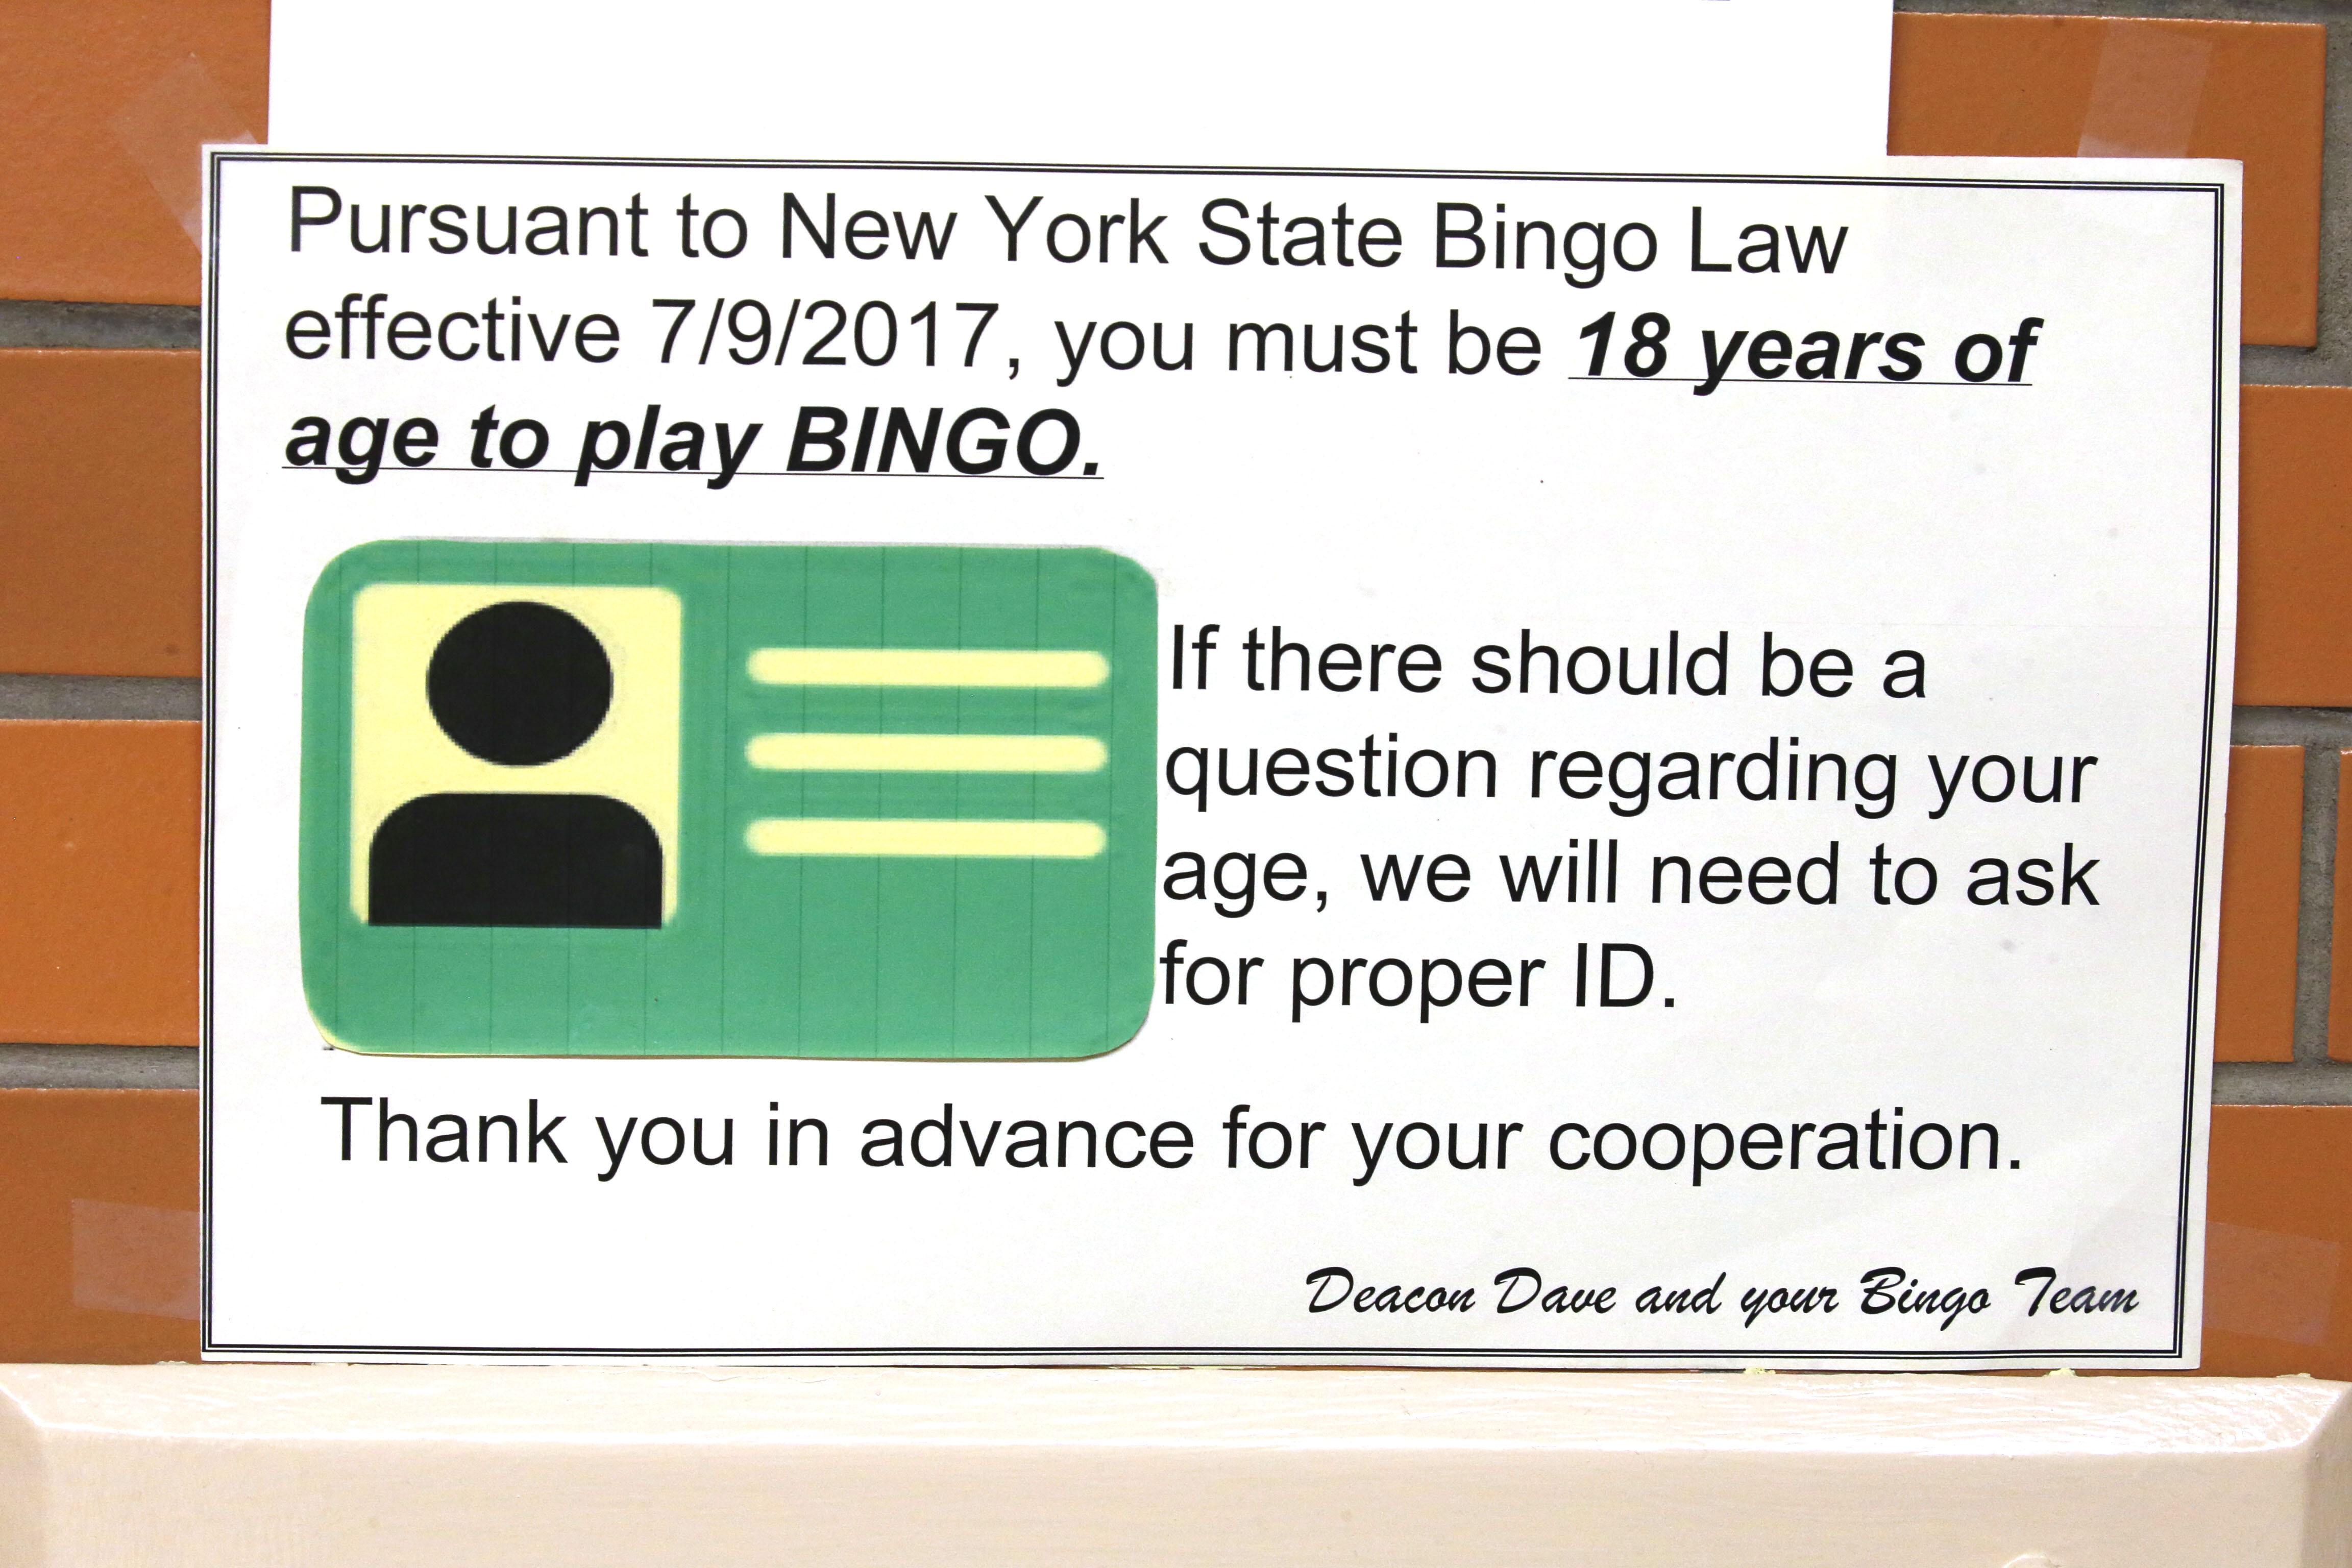 Parish Hall In Sloan Warns That A New State Law Bars Anyone Under 18 From Playing Bingo Robert Kirkham Buffalo News